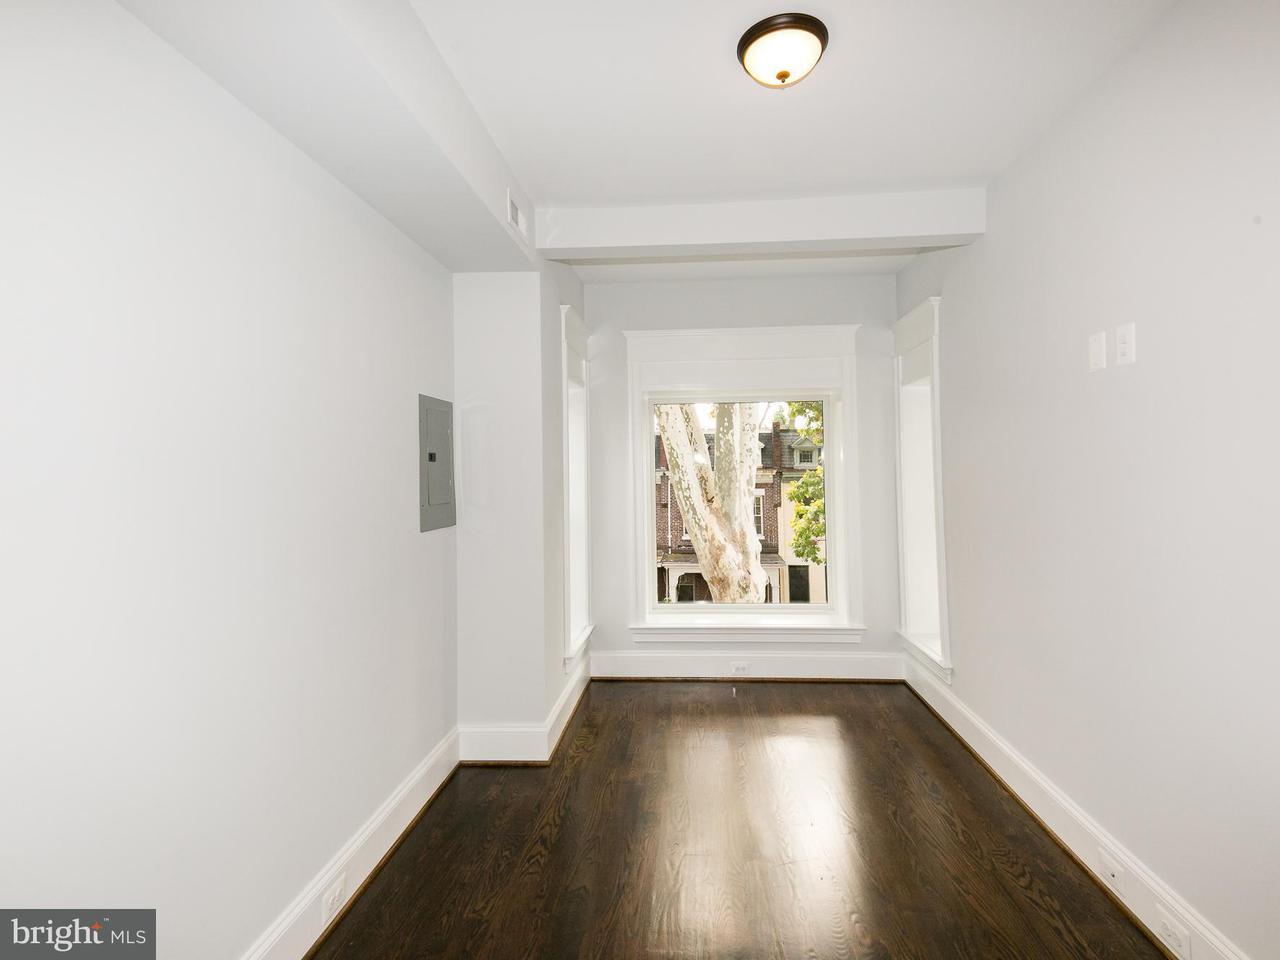 Additional photo for property listing at 1717 Euclid St Nw #4 1717 Euclid St Nw #4 Washington, Περιφερεια Τησ Κολουμπια 20009 Ηνωμενεσ Πολιτειεσ